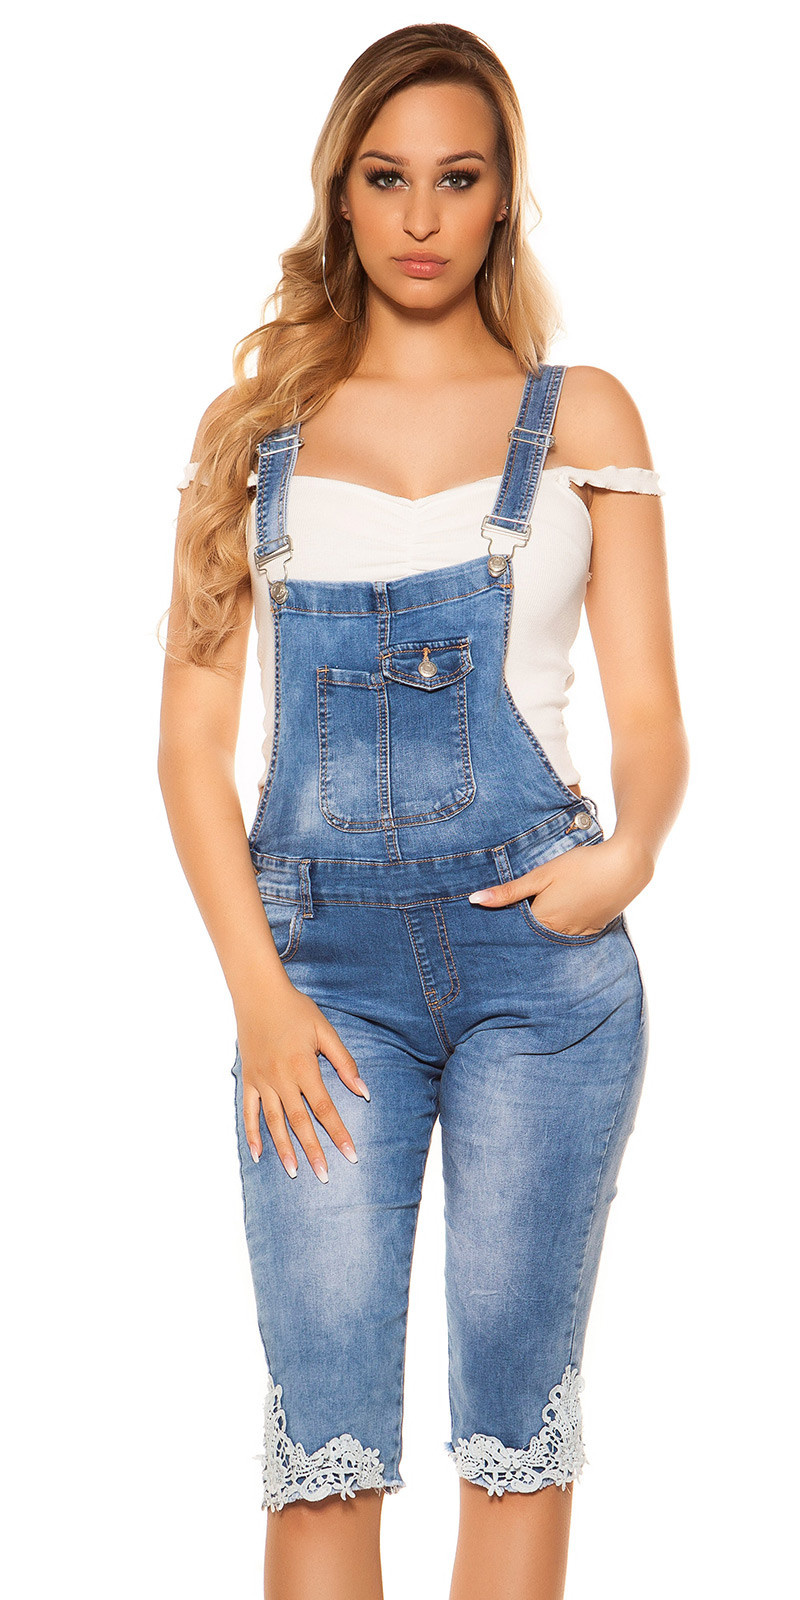 Trendy tuinbroek capri-driekwarts jeans met kant jeansblauw